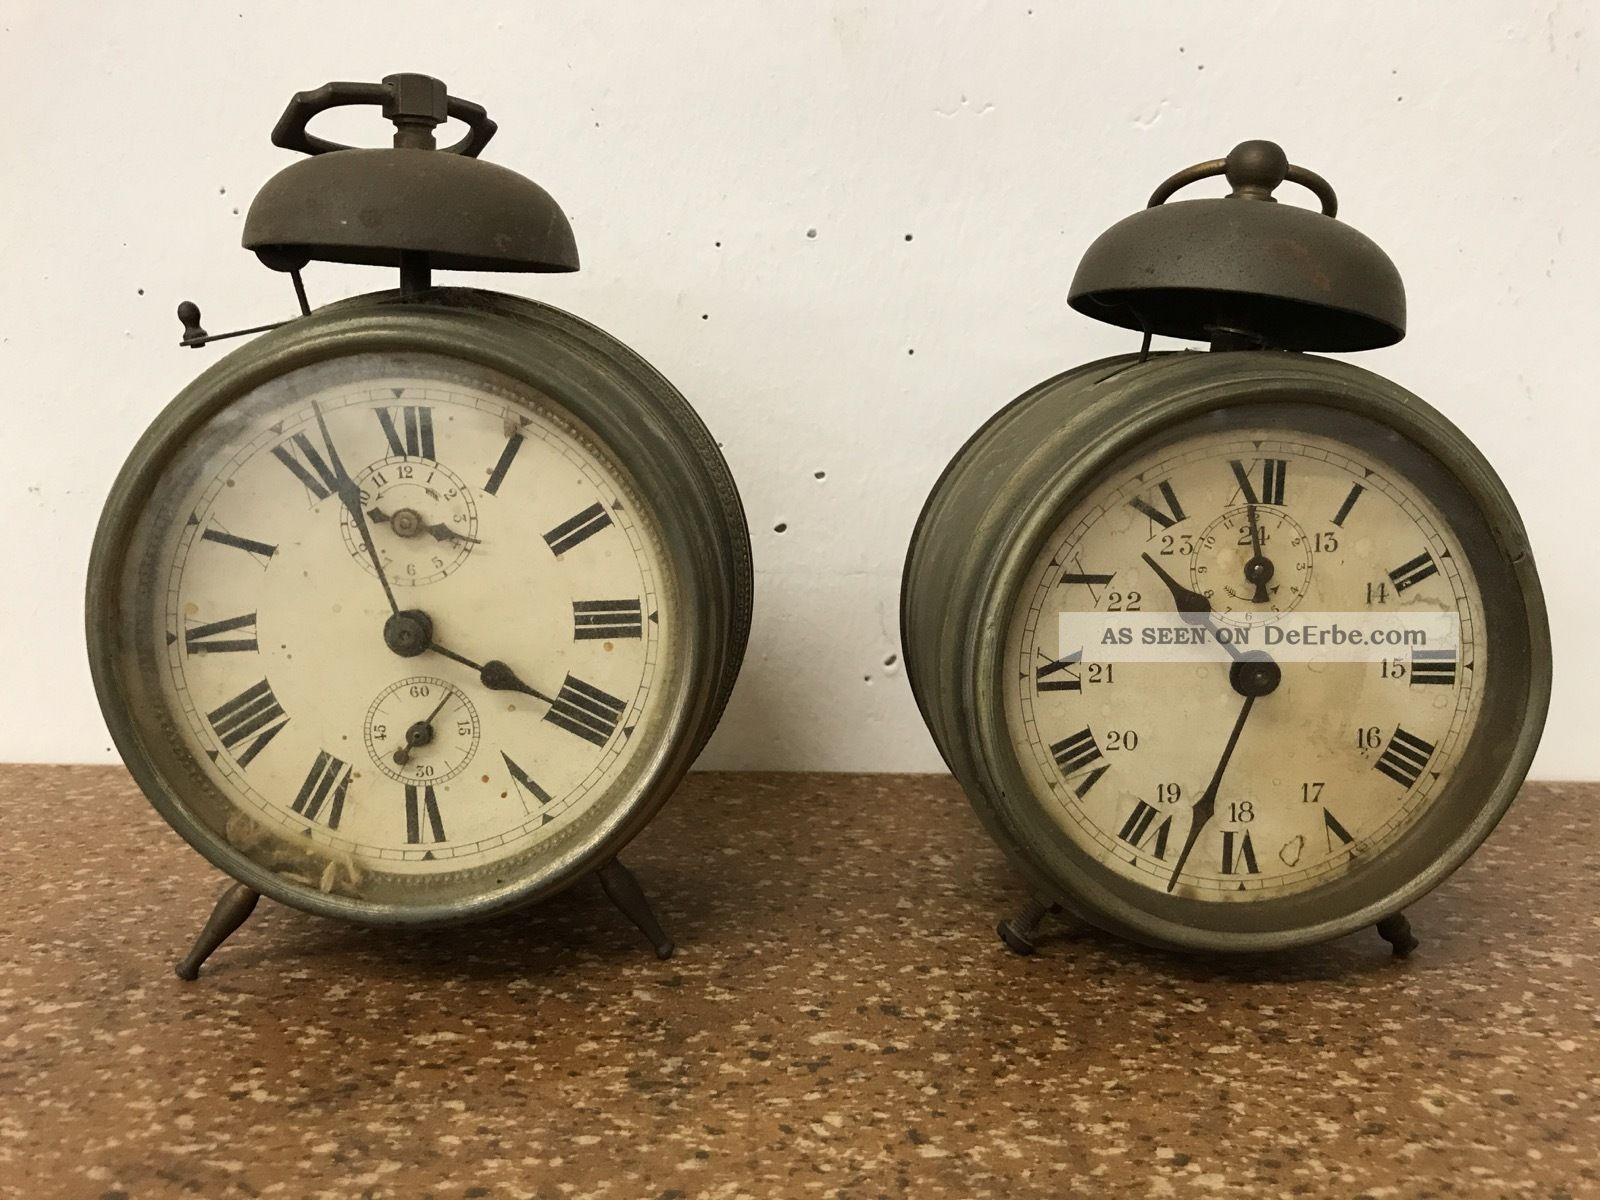 2 Franz.  Antike Wecker Tischuhr Uhr - Pignons Acier Tailles,  Le Vainqueur Fab Antike Originale vor 1950 Bild